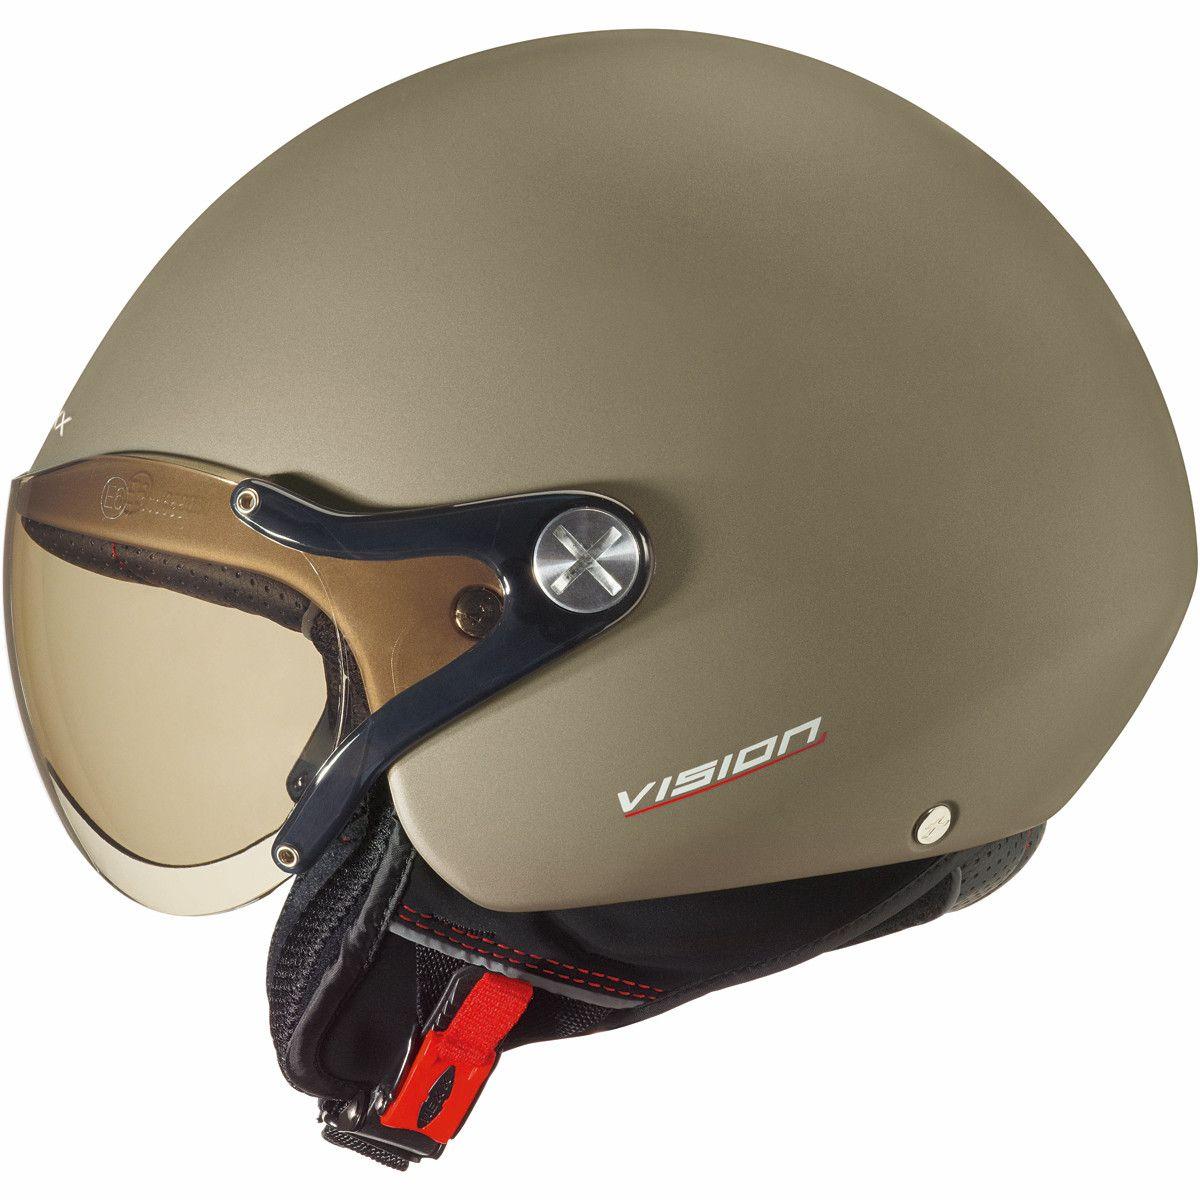 6892fe4f Nexx X60 Vision Plus Helmet in Khaki - Stylish, lightweight, composite  fibre, urban helmet with internal sun visor from #Nexx.